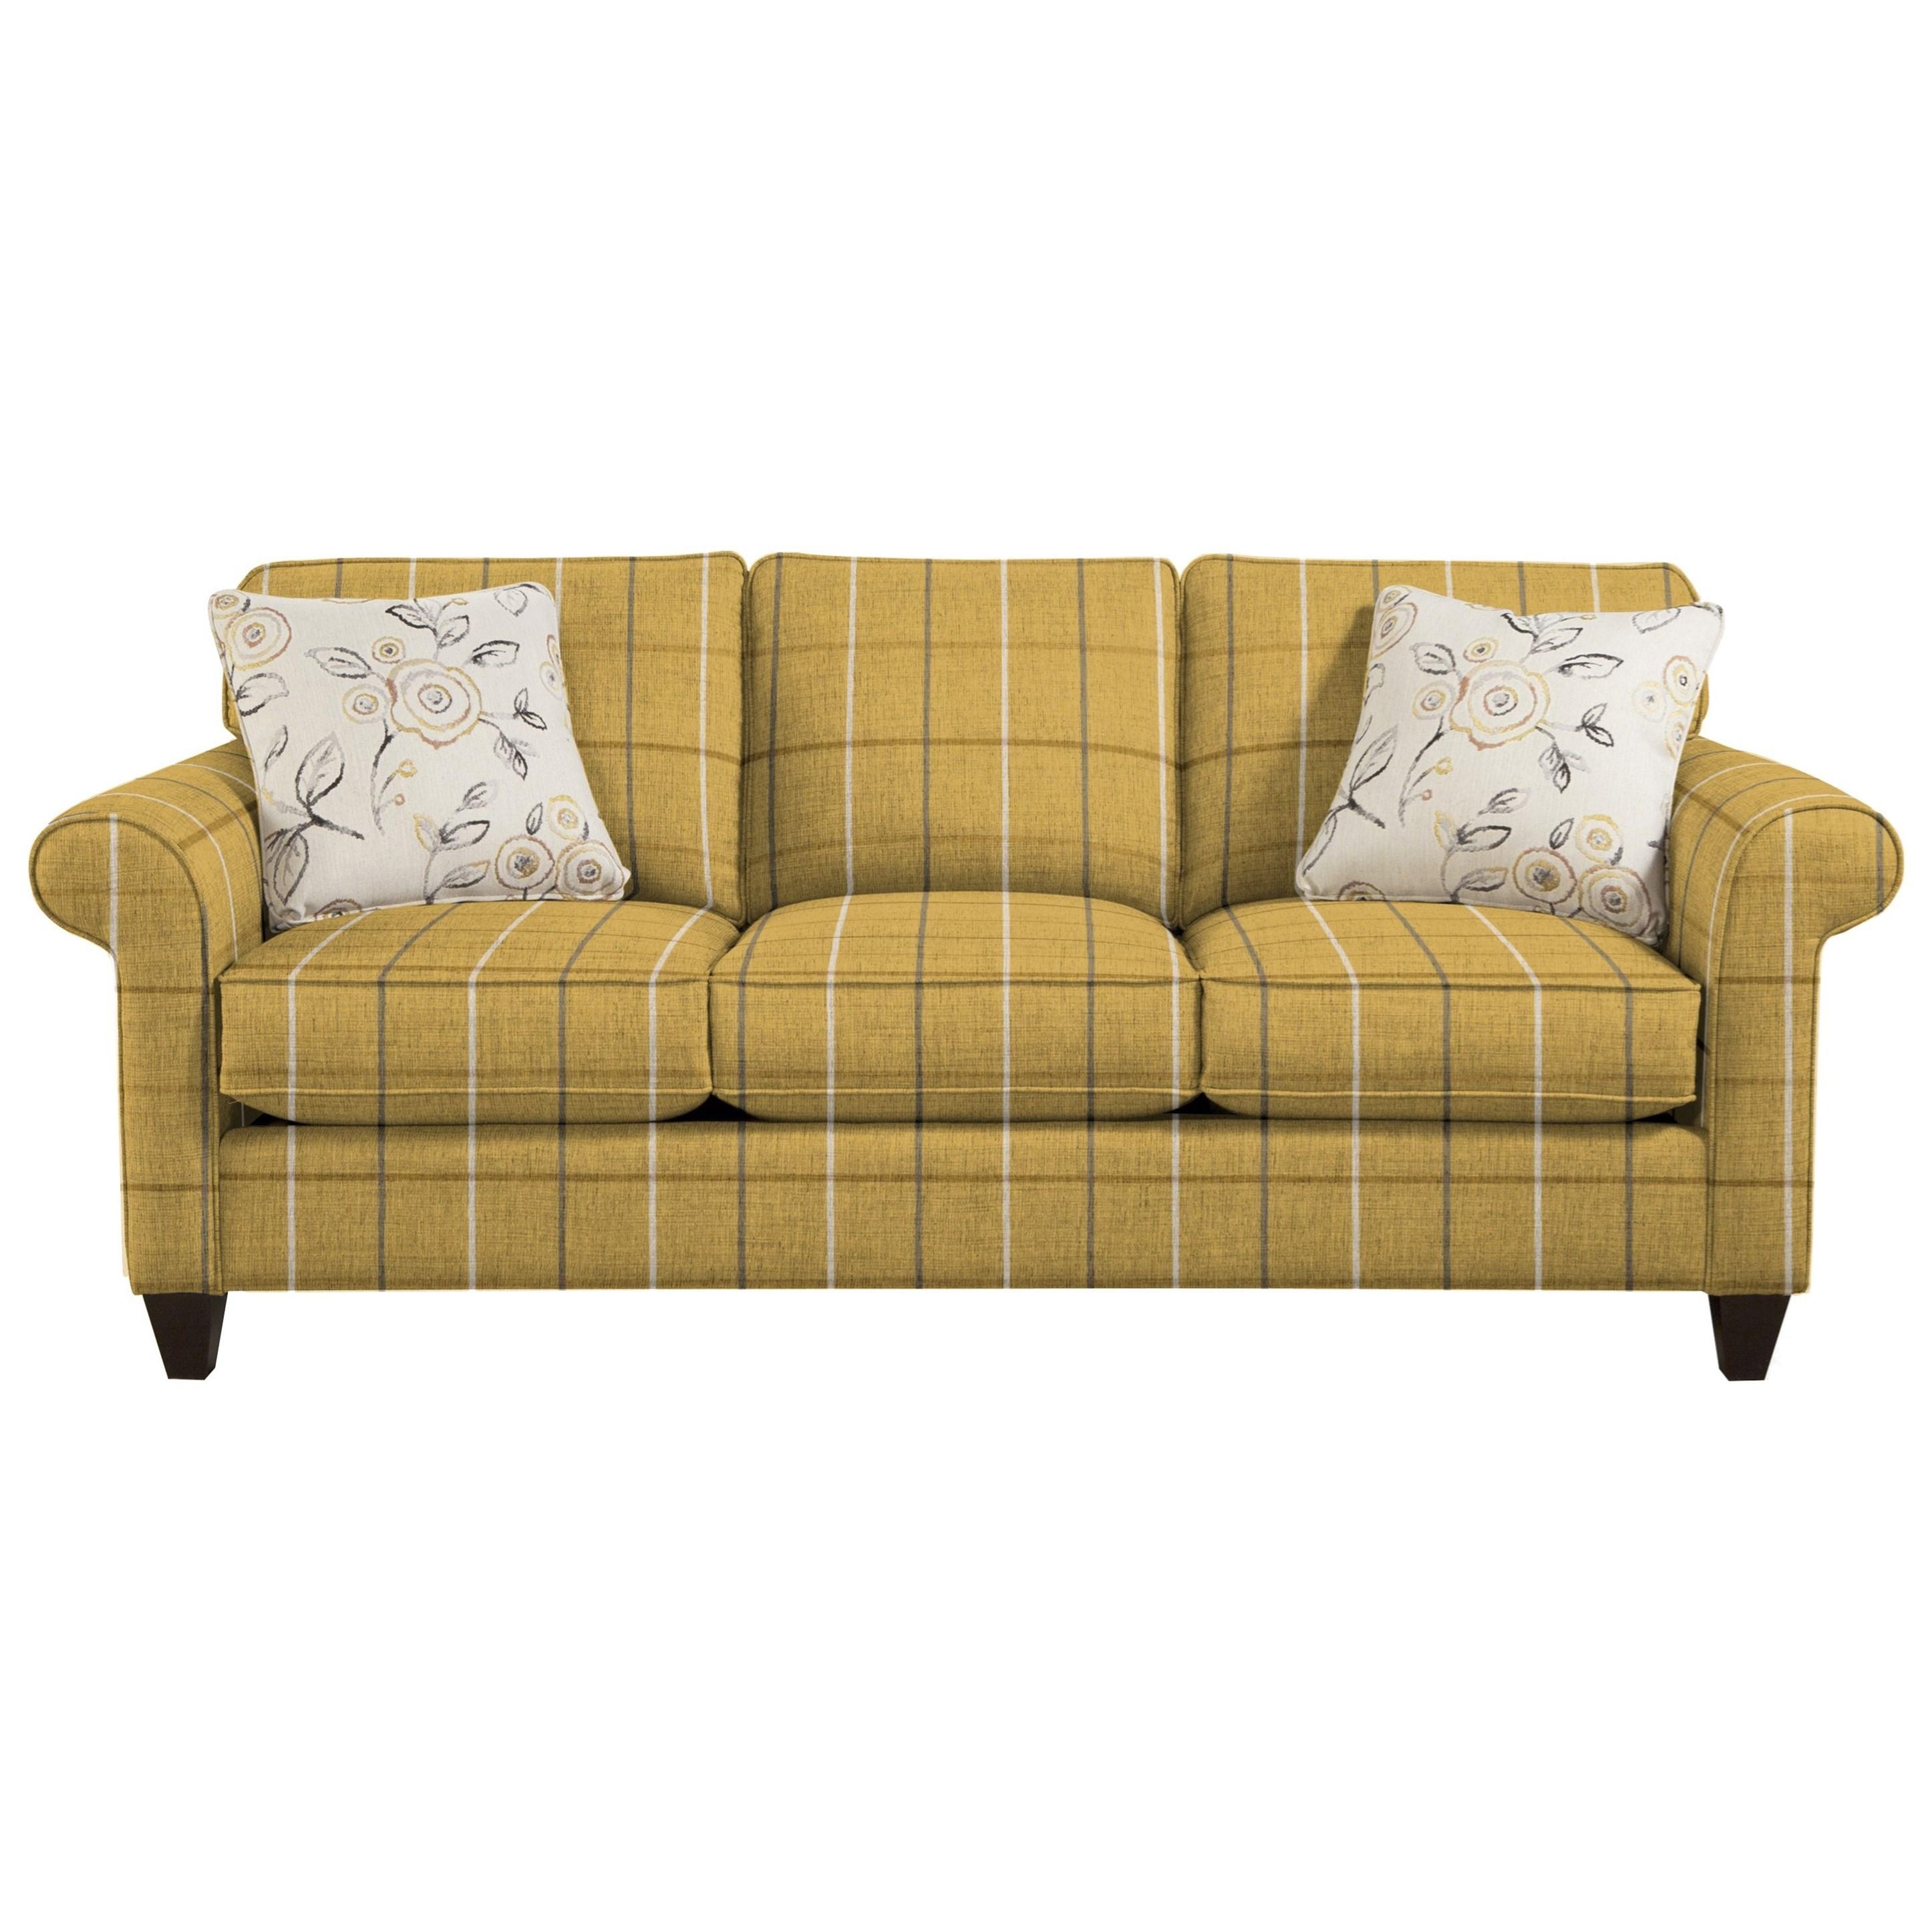 7421 Sofa by Craftmaster at Baer's Furniture